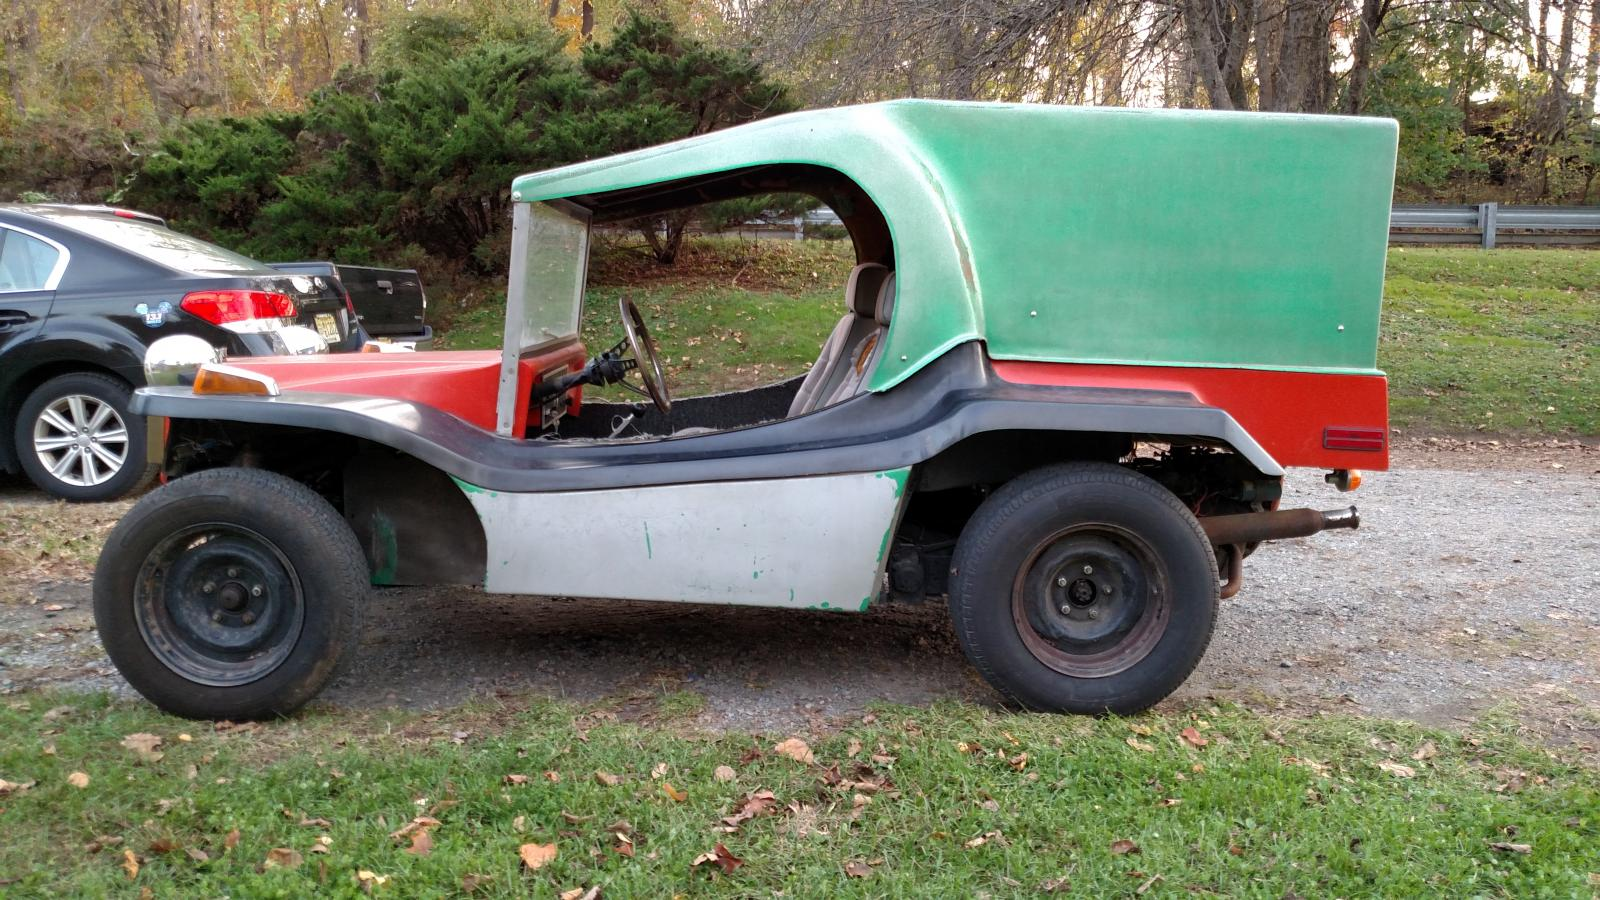 TheSamba com :: Gallery - Sand Rover Mini bucket T dune buggy